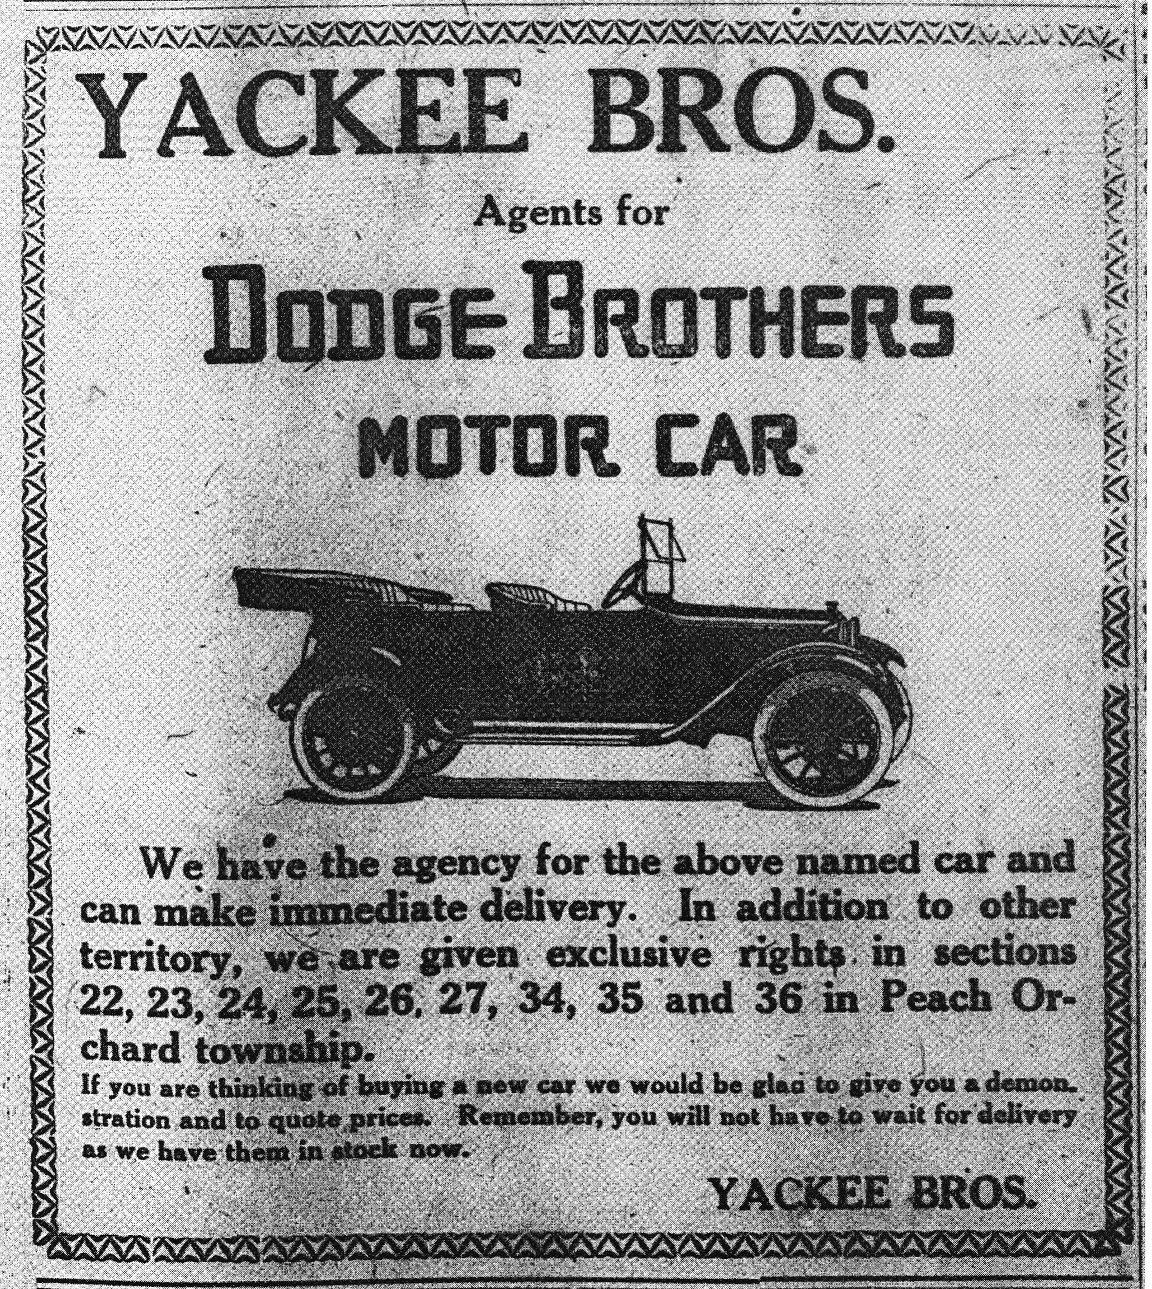 Yackee Bros. 1920 Ad